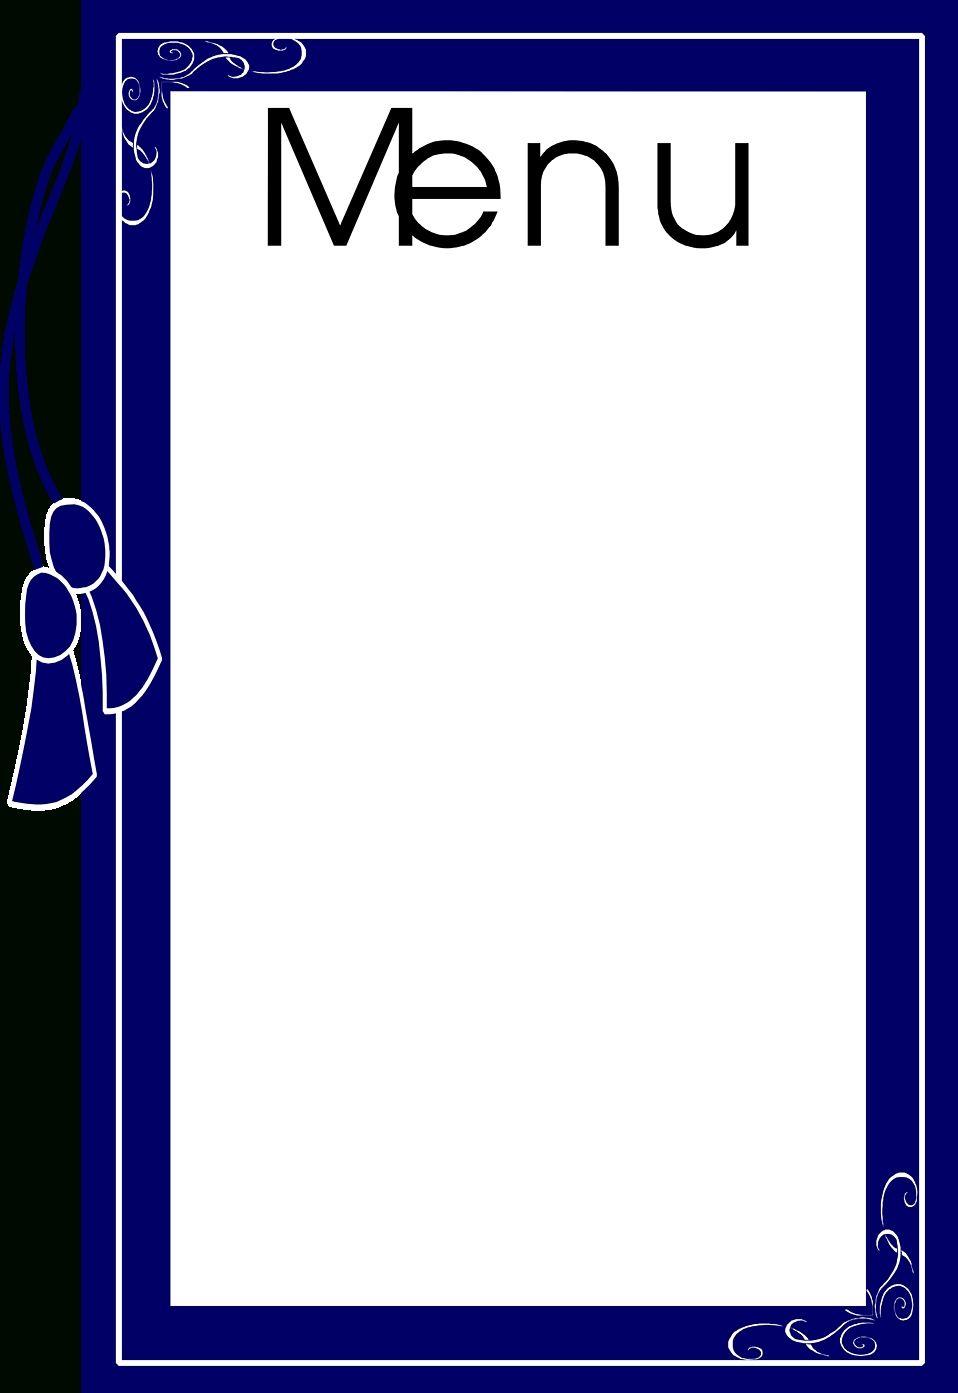 Blank menus clipart graphic free download Awesome Blank Menu Clipart | Baggrunde | Pinterest | Menu And Food ... graphic free download